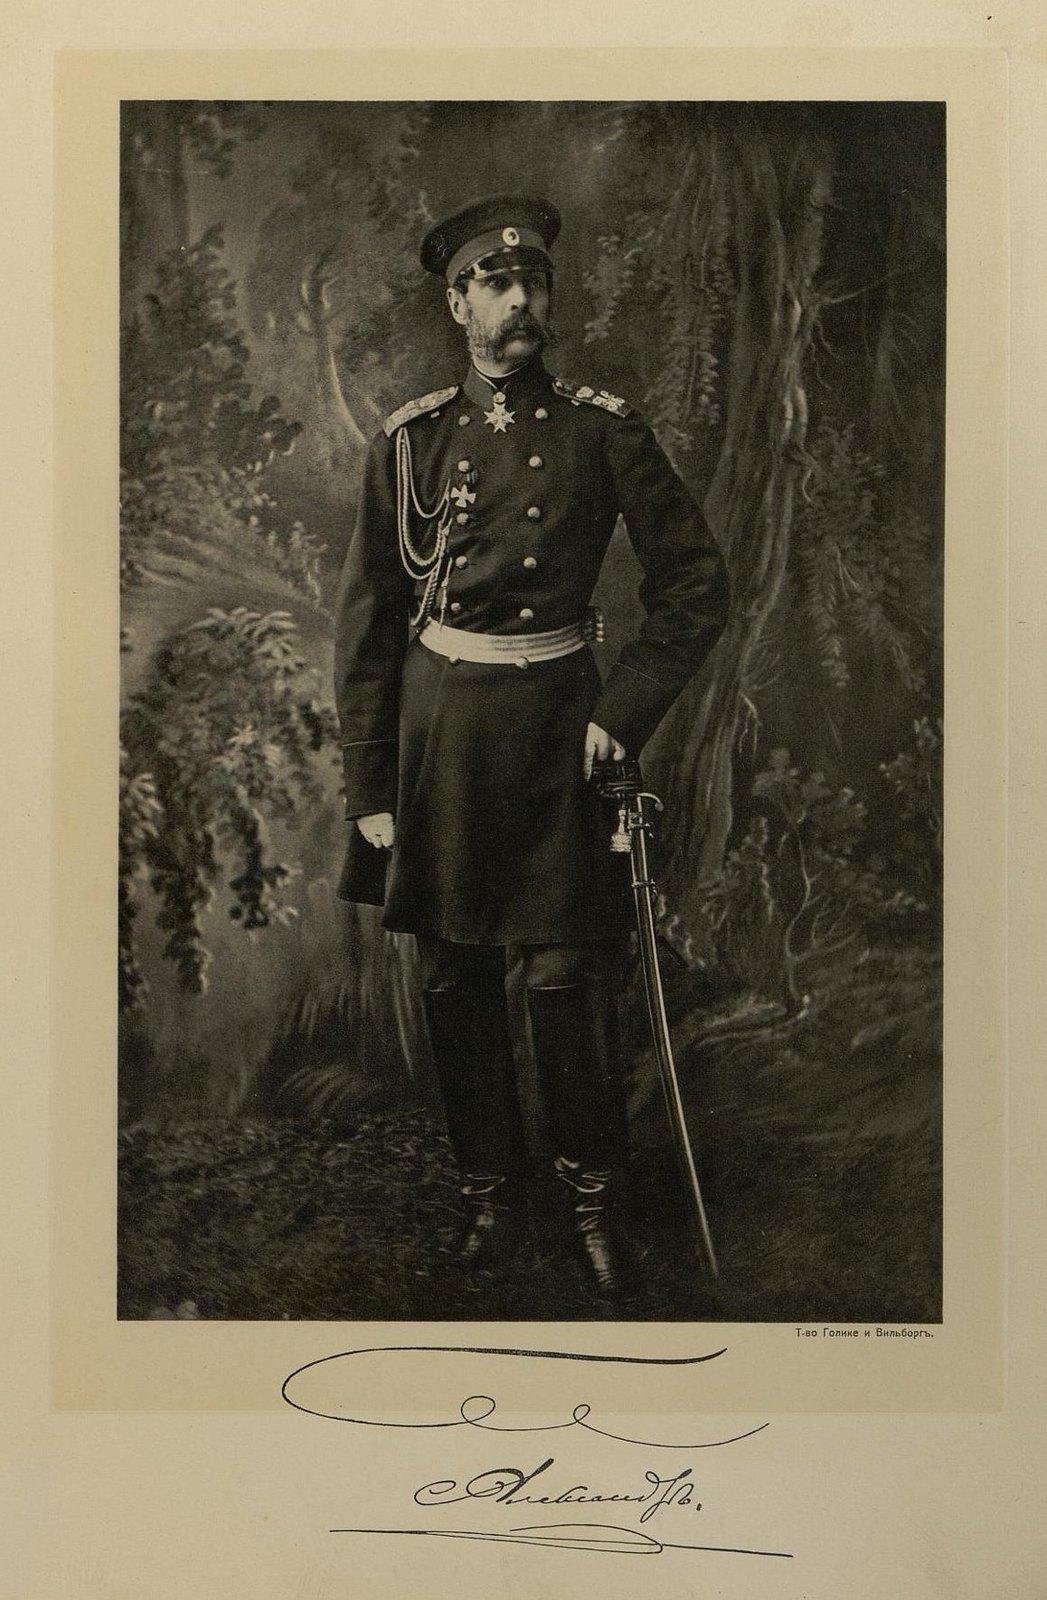 01. Портрет императора Александра II